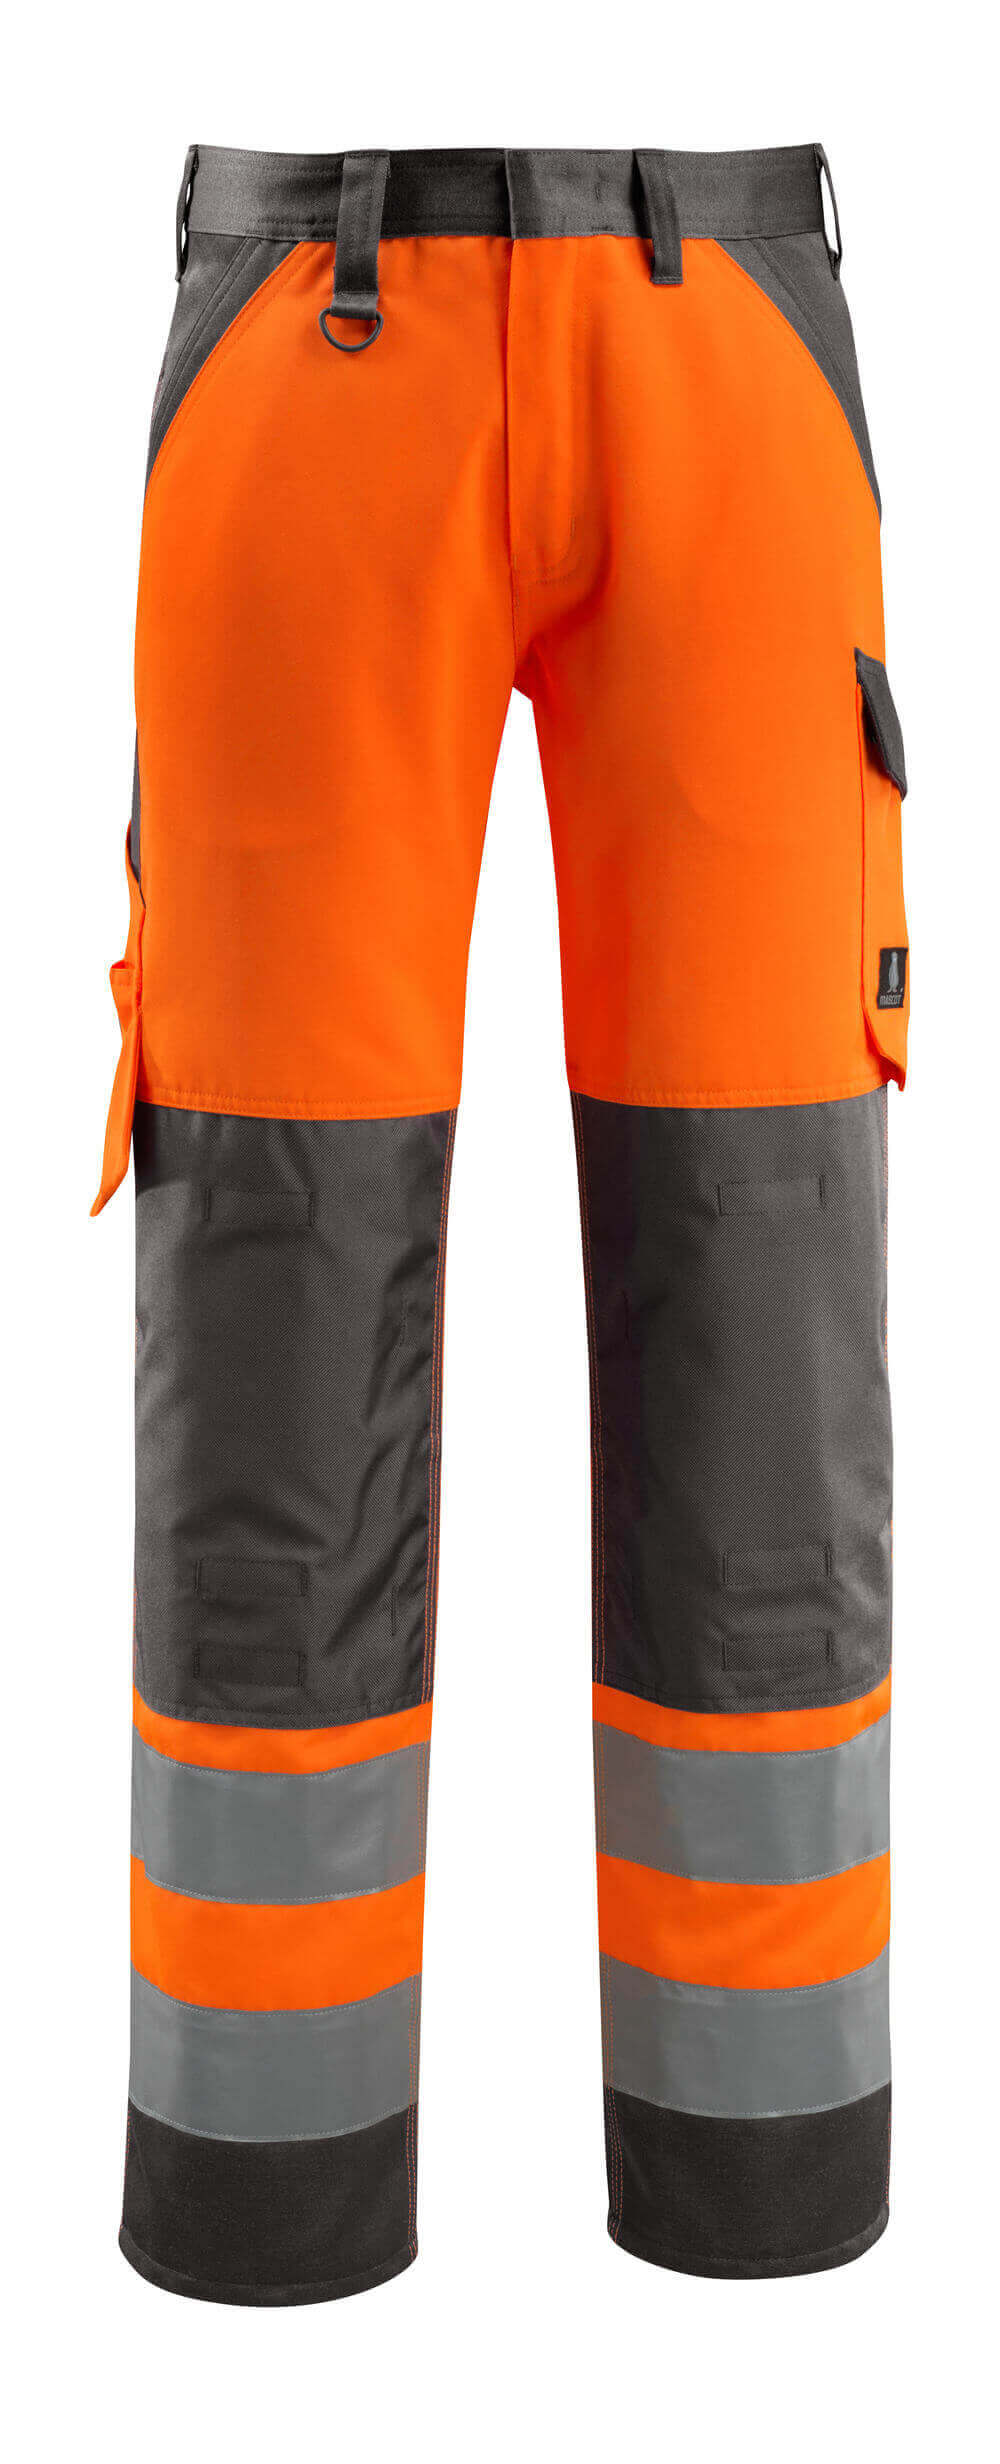 15979-948-1418 Arbeitshose - hi-vis Orange/Dunkelanthrazit